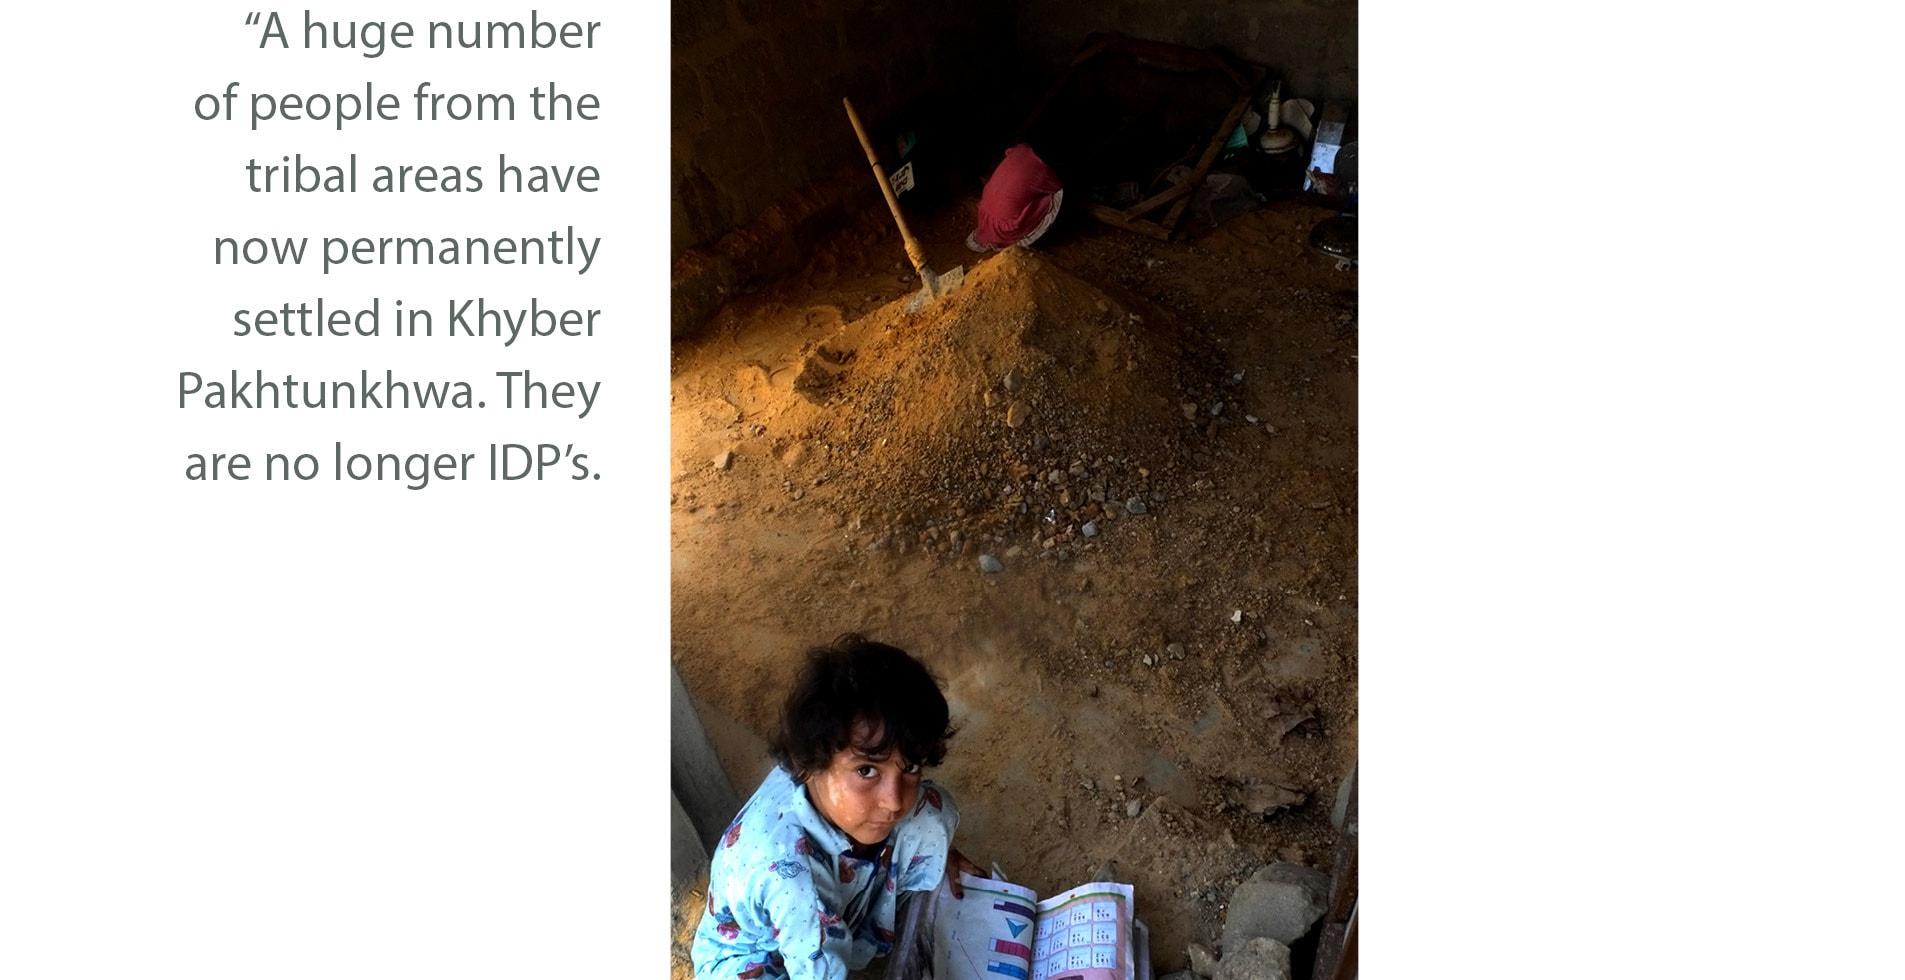 Children play inside a building under construction in Baloch Goth, Karachi   Malika Abbas, White Star